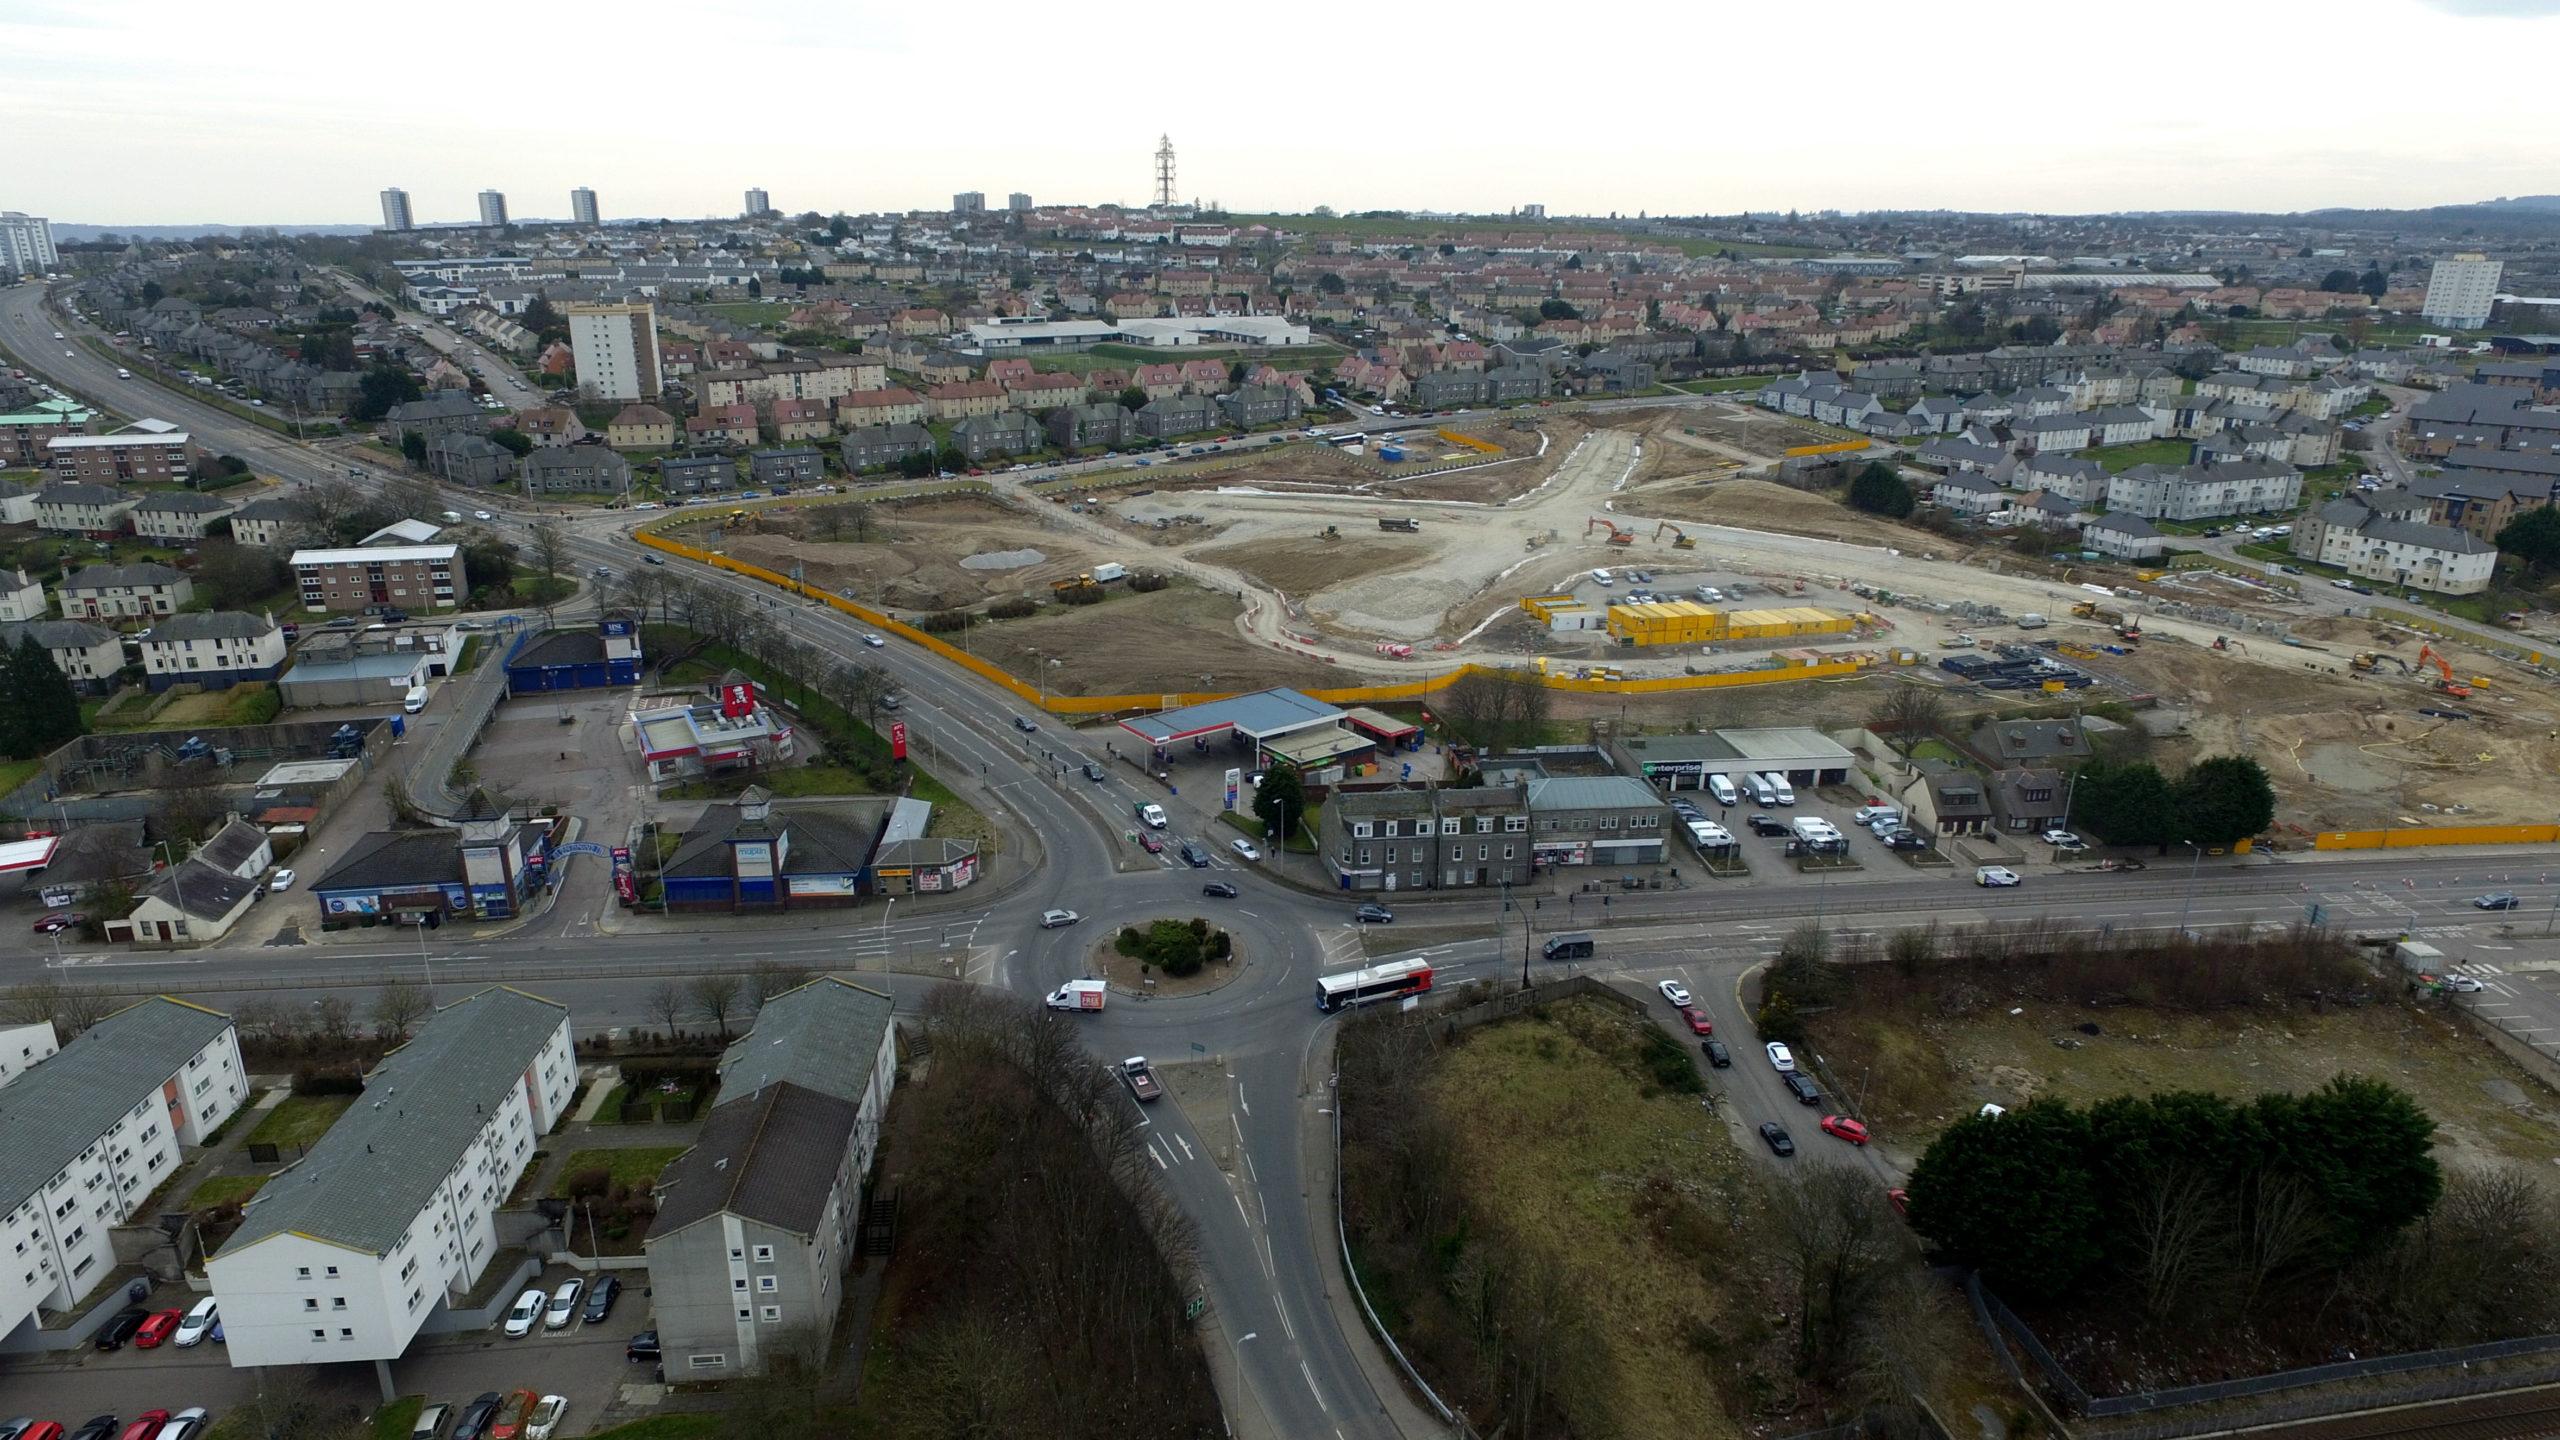 The Haudagain Roundabout.